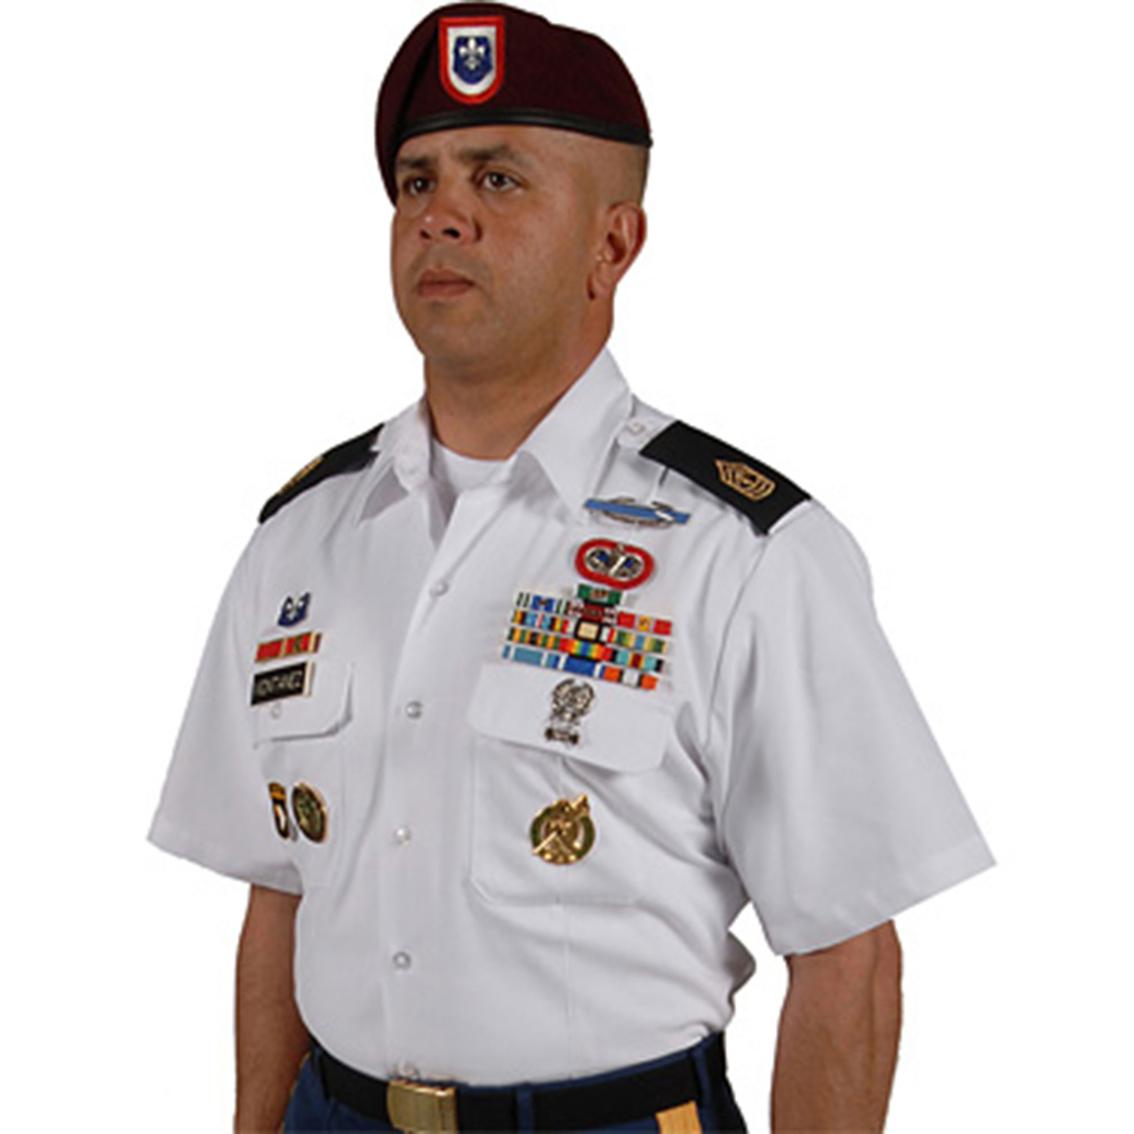 Photos of Class B Army Uniform